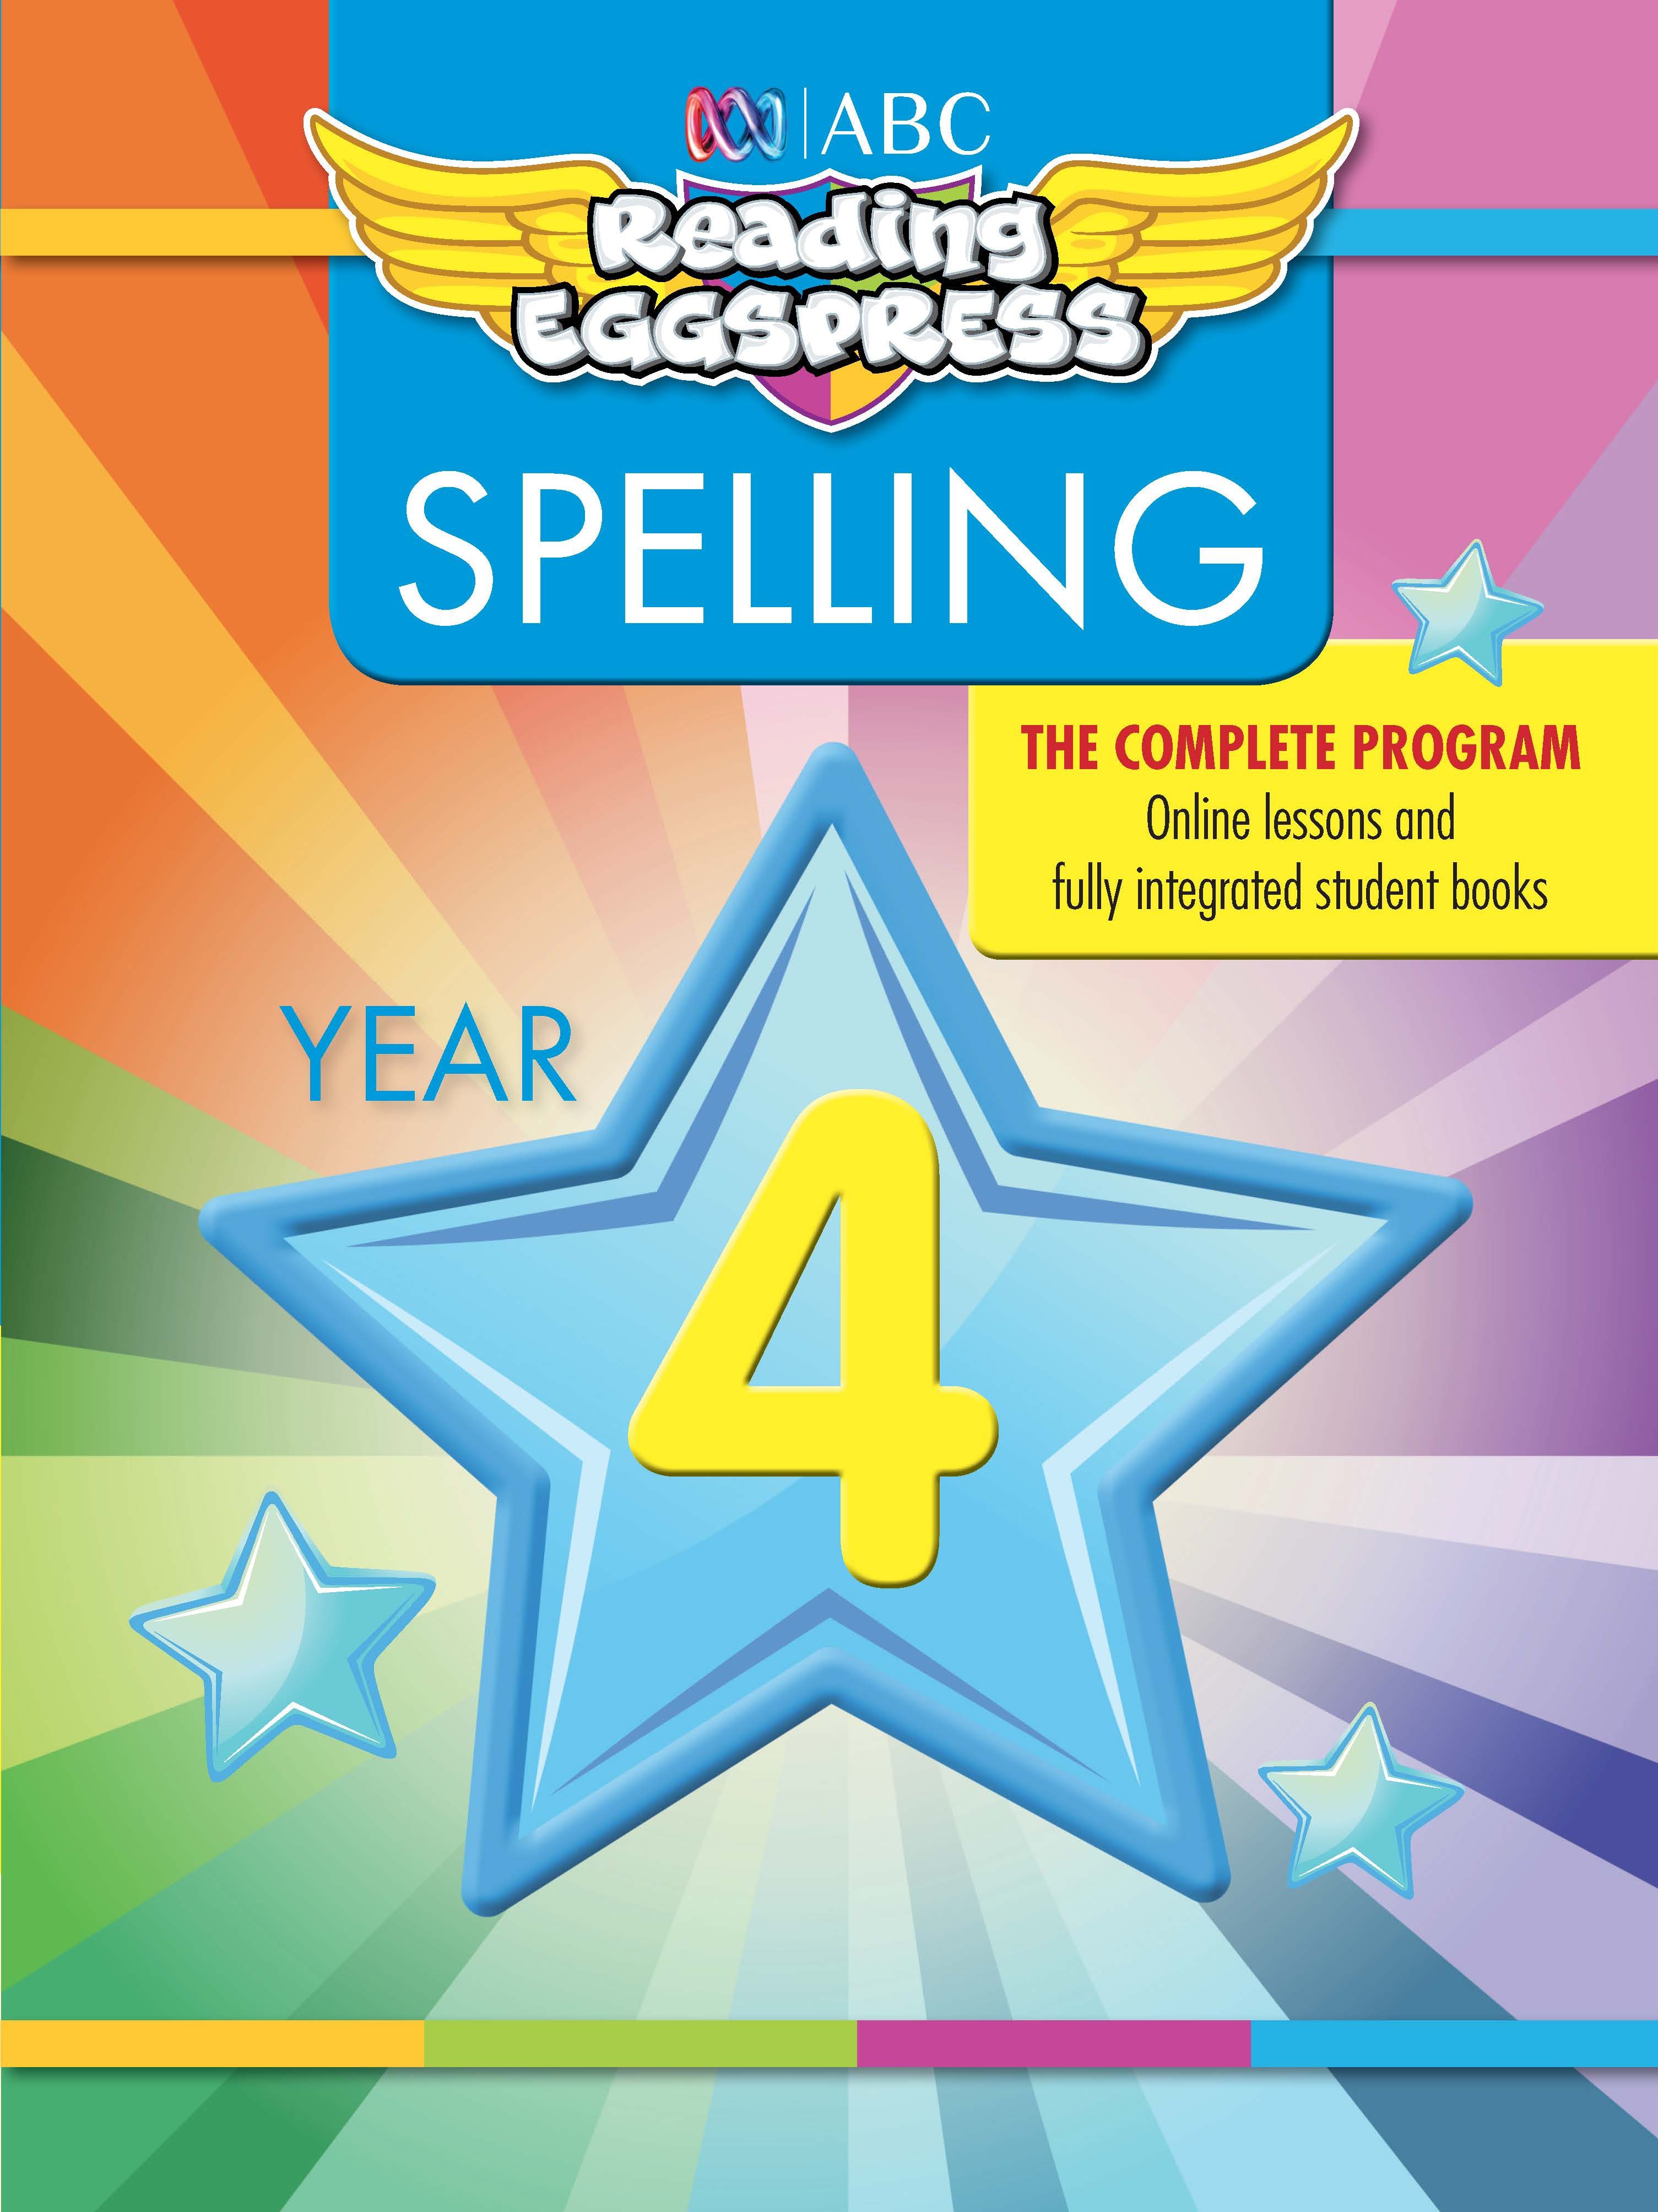 ABC Reading Eggspress Spelling Workbook Year 4